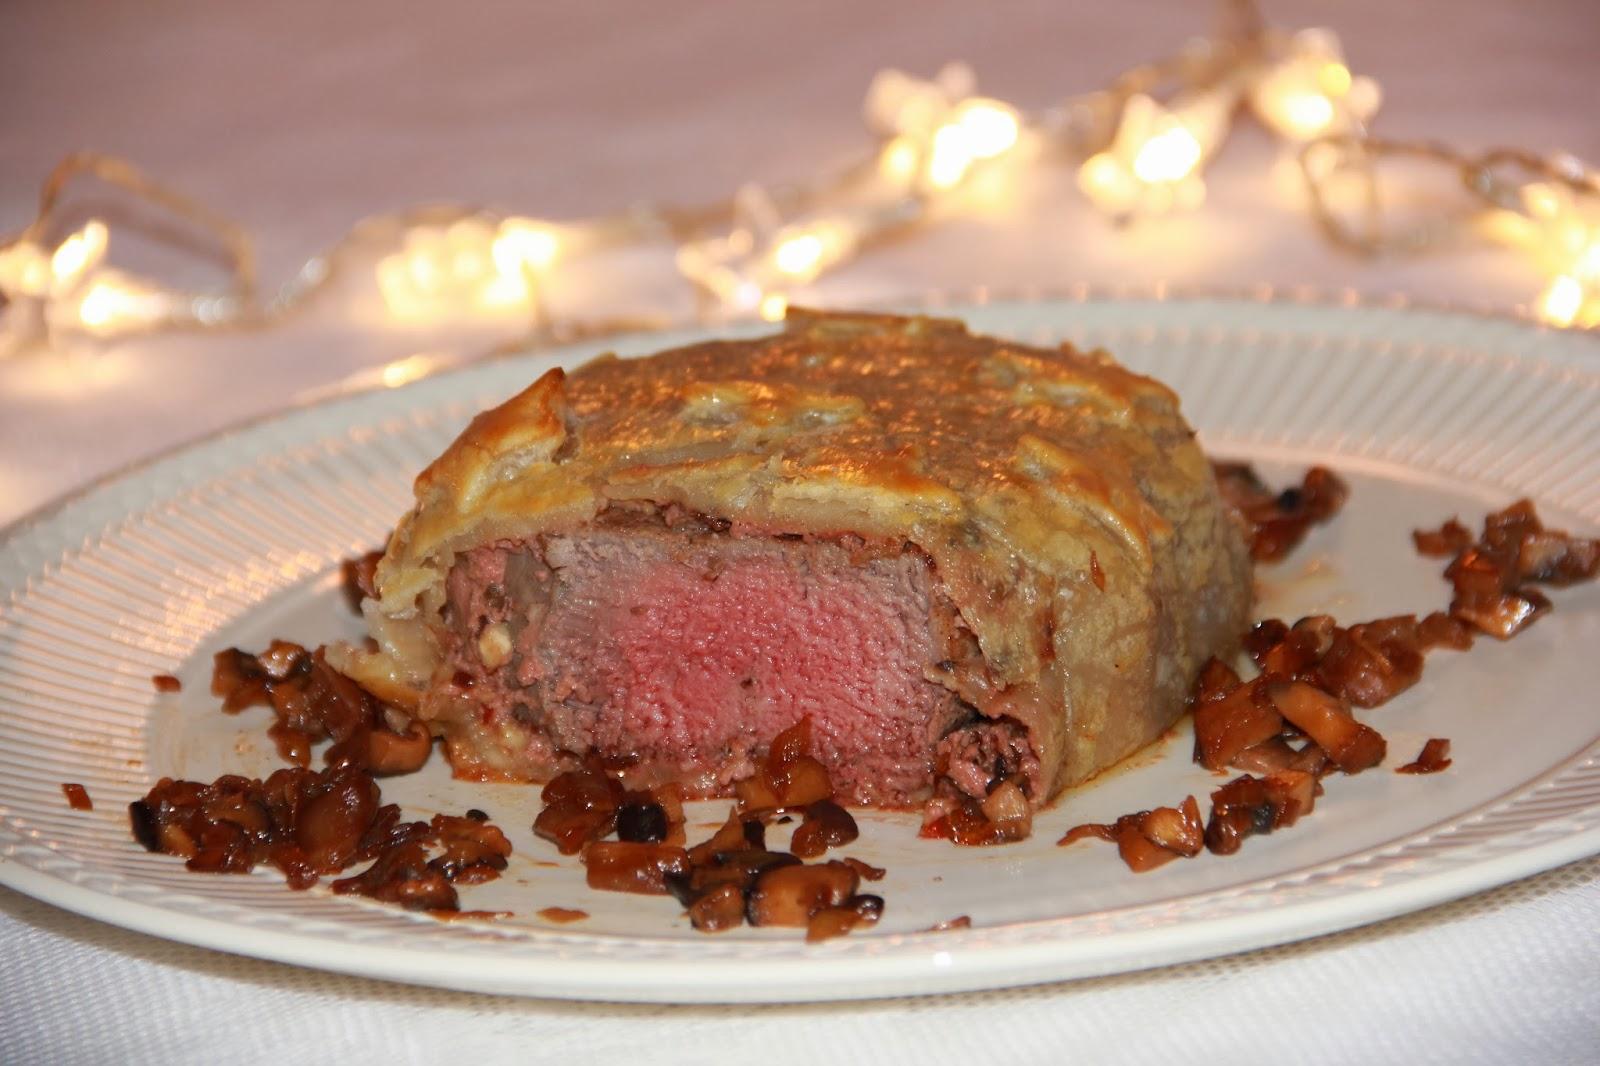 kertmenu 2013 - Beef Wellington - www.desmaakvancecile.com